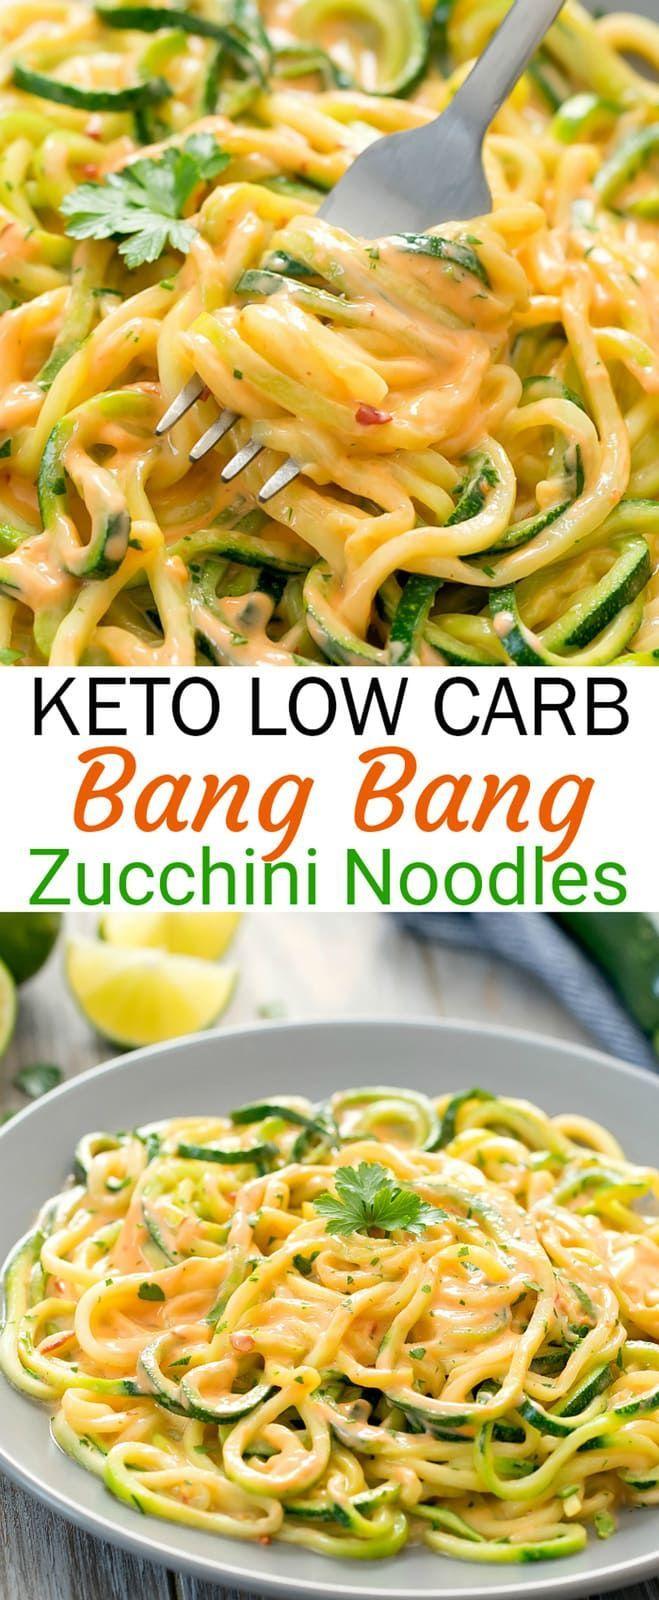 Keto Bang Bang Zucchini Nudeln. Zucchini-Nudeln werden in einer Low-Carb-Version…